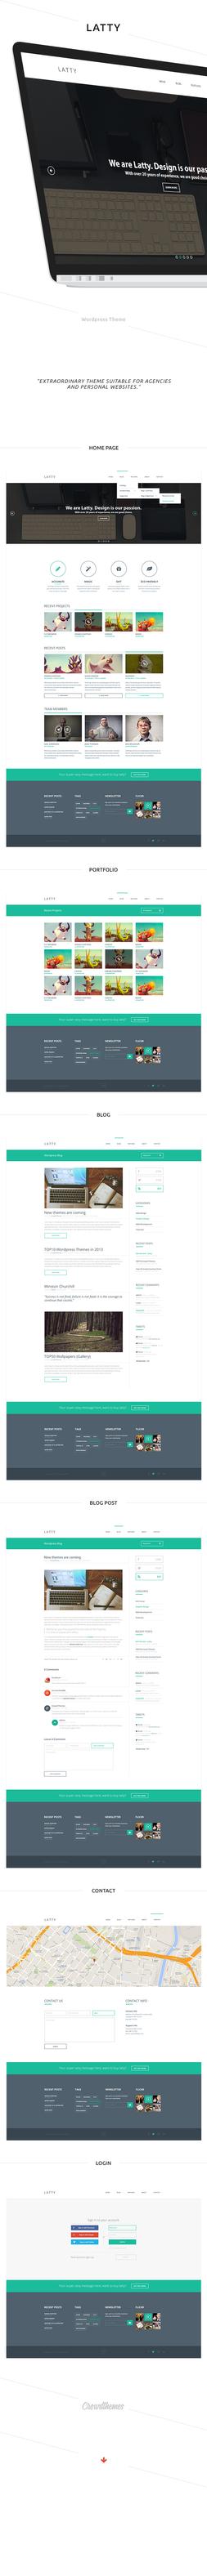 LATTY - Wordpress Theme by Crowd-Themes.com by harmonikas996